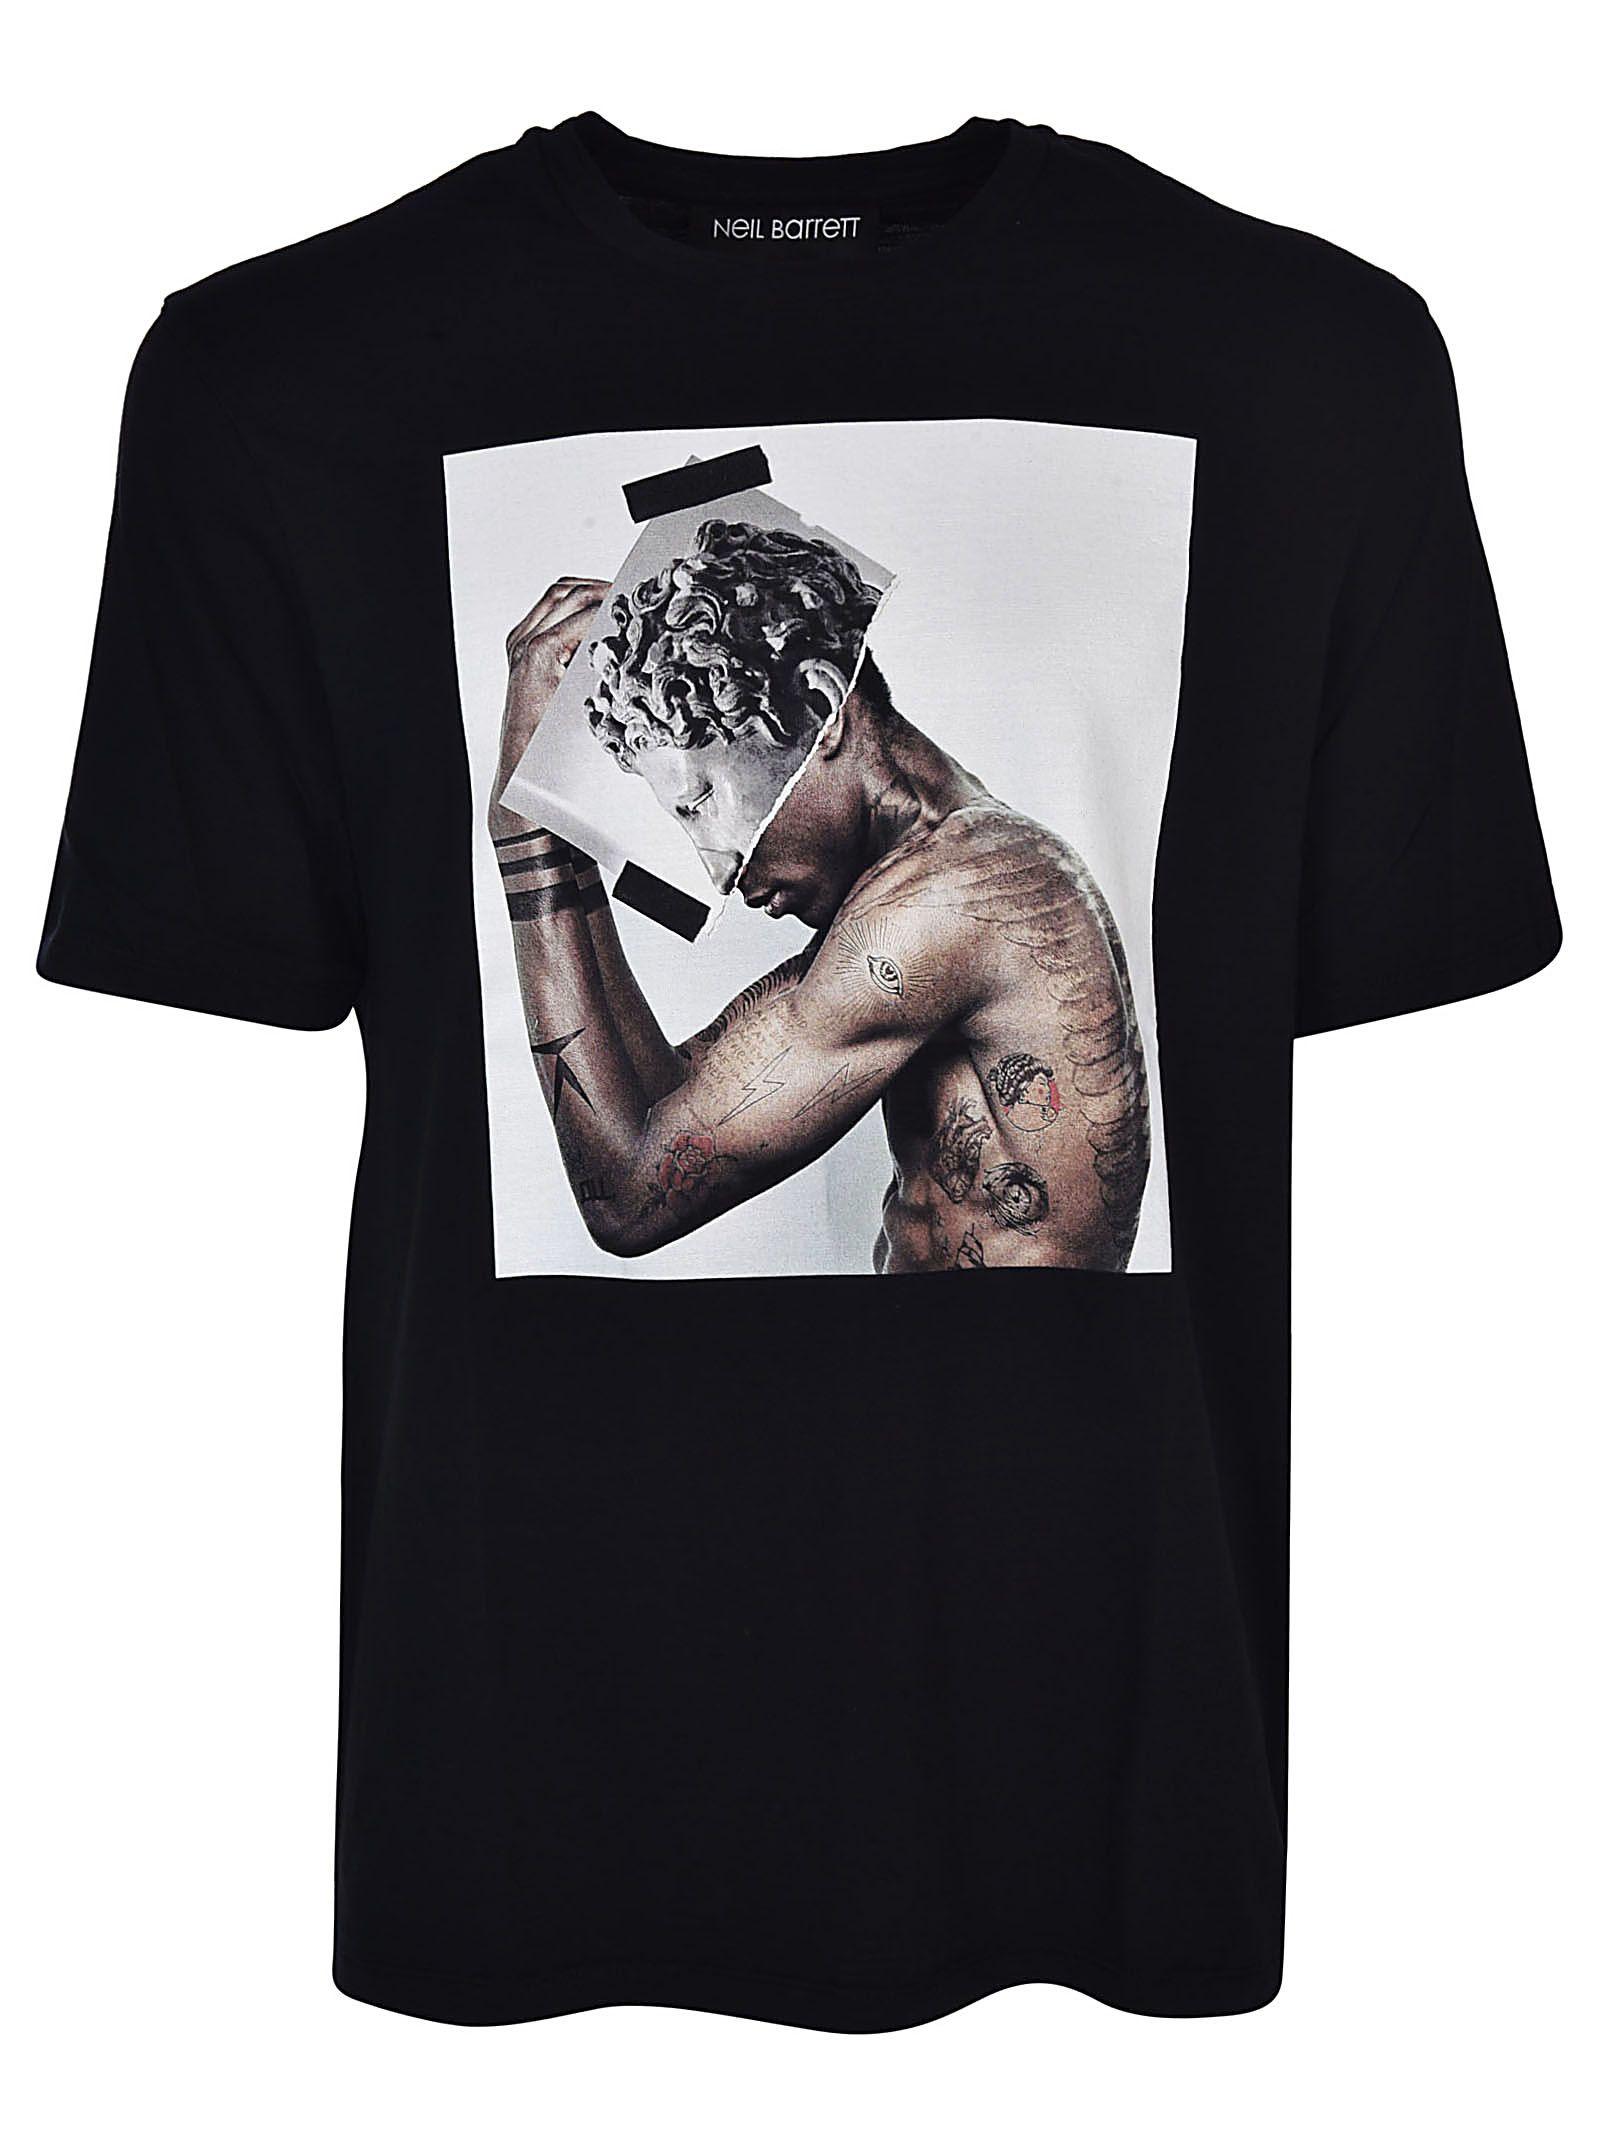 Neil Barrett Graphic Print T-shirt